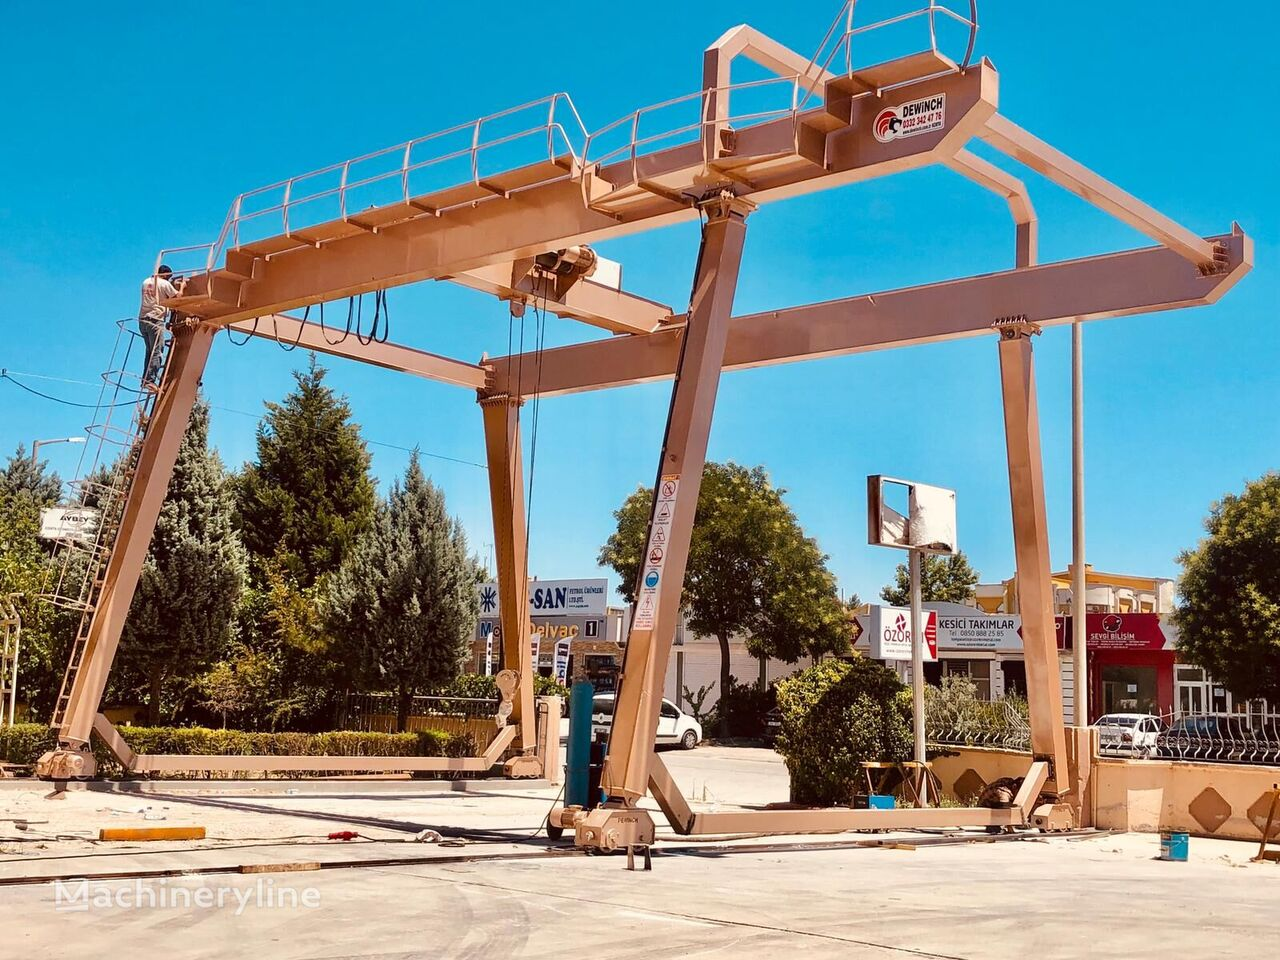 new DEWINCH 10 TONS 16 METERS GANTRY CRANE BRAND NEW DWC-40 gantry crane